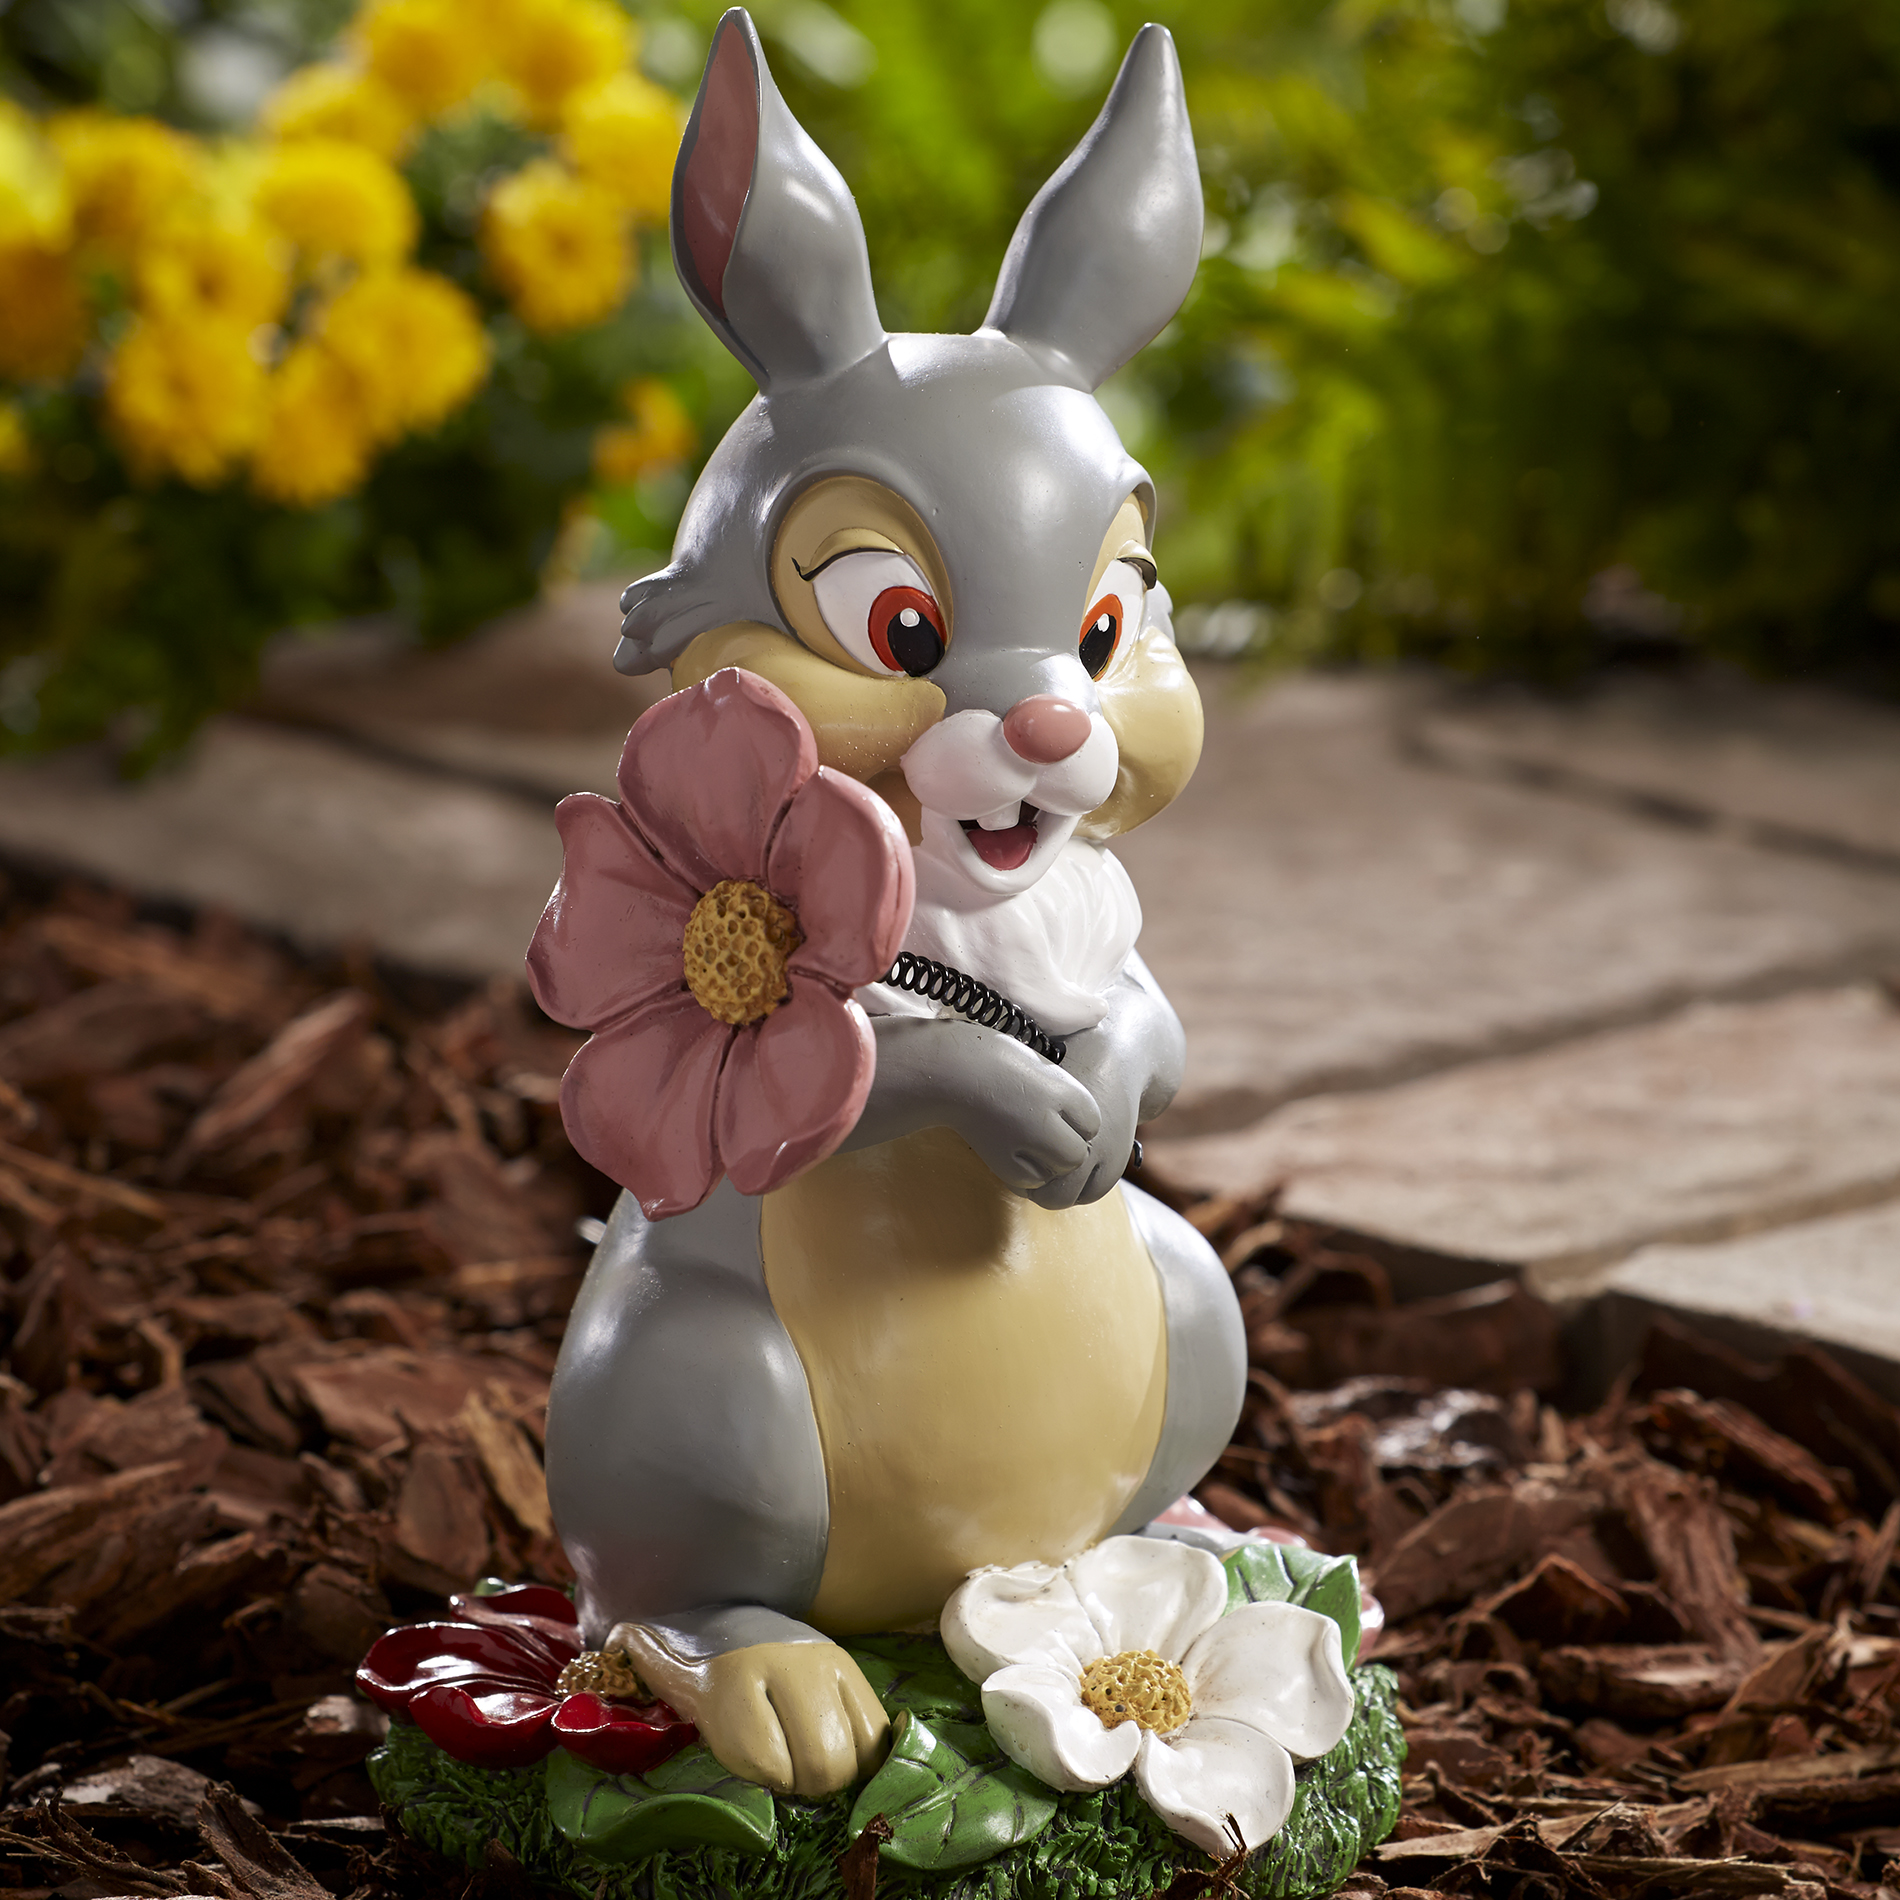 Disney Flower And Garden Statues